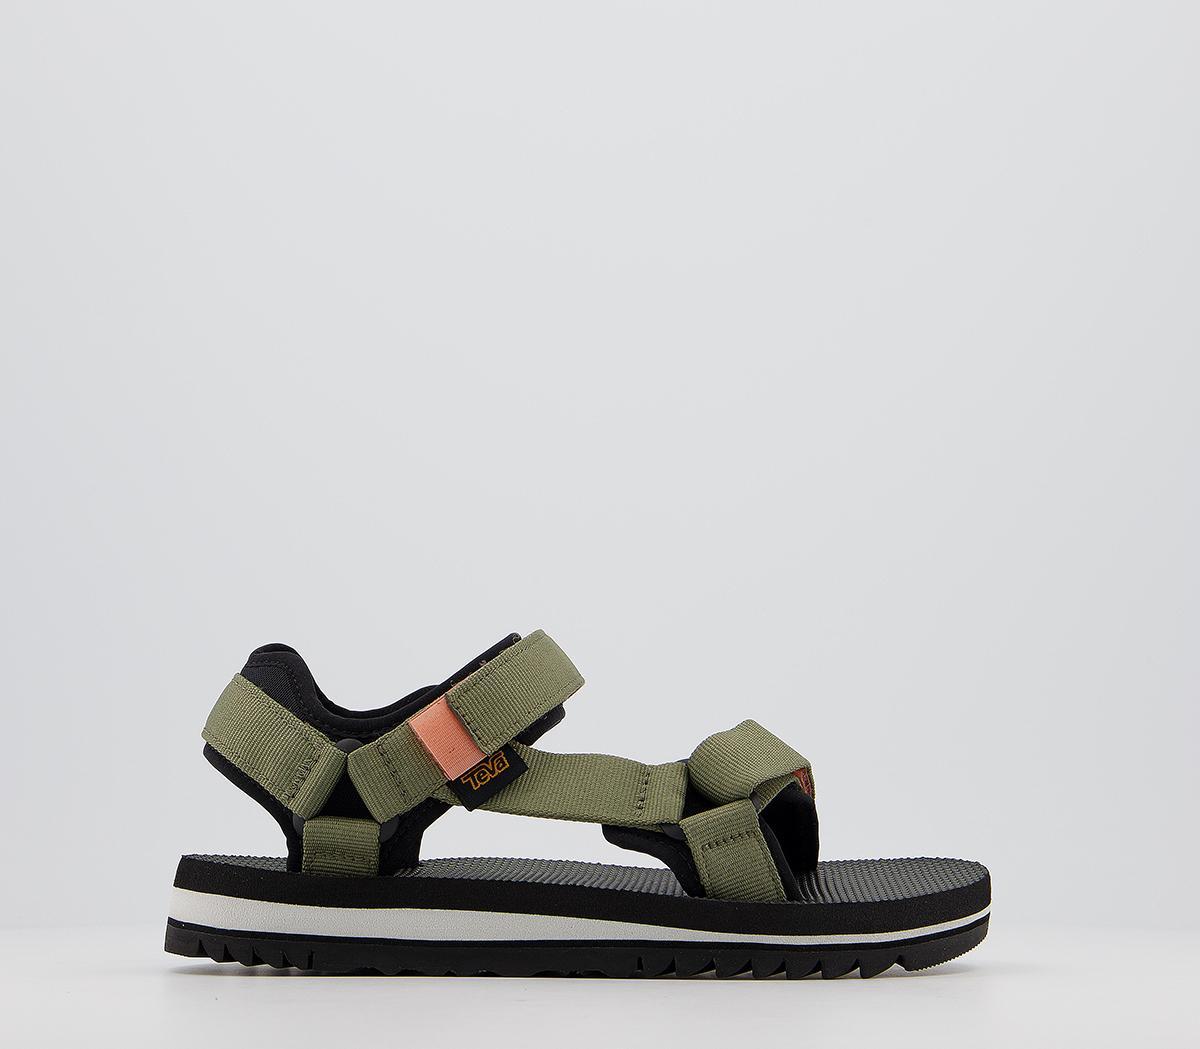 Universal Trail Sandals